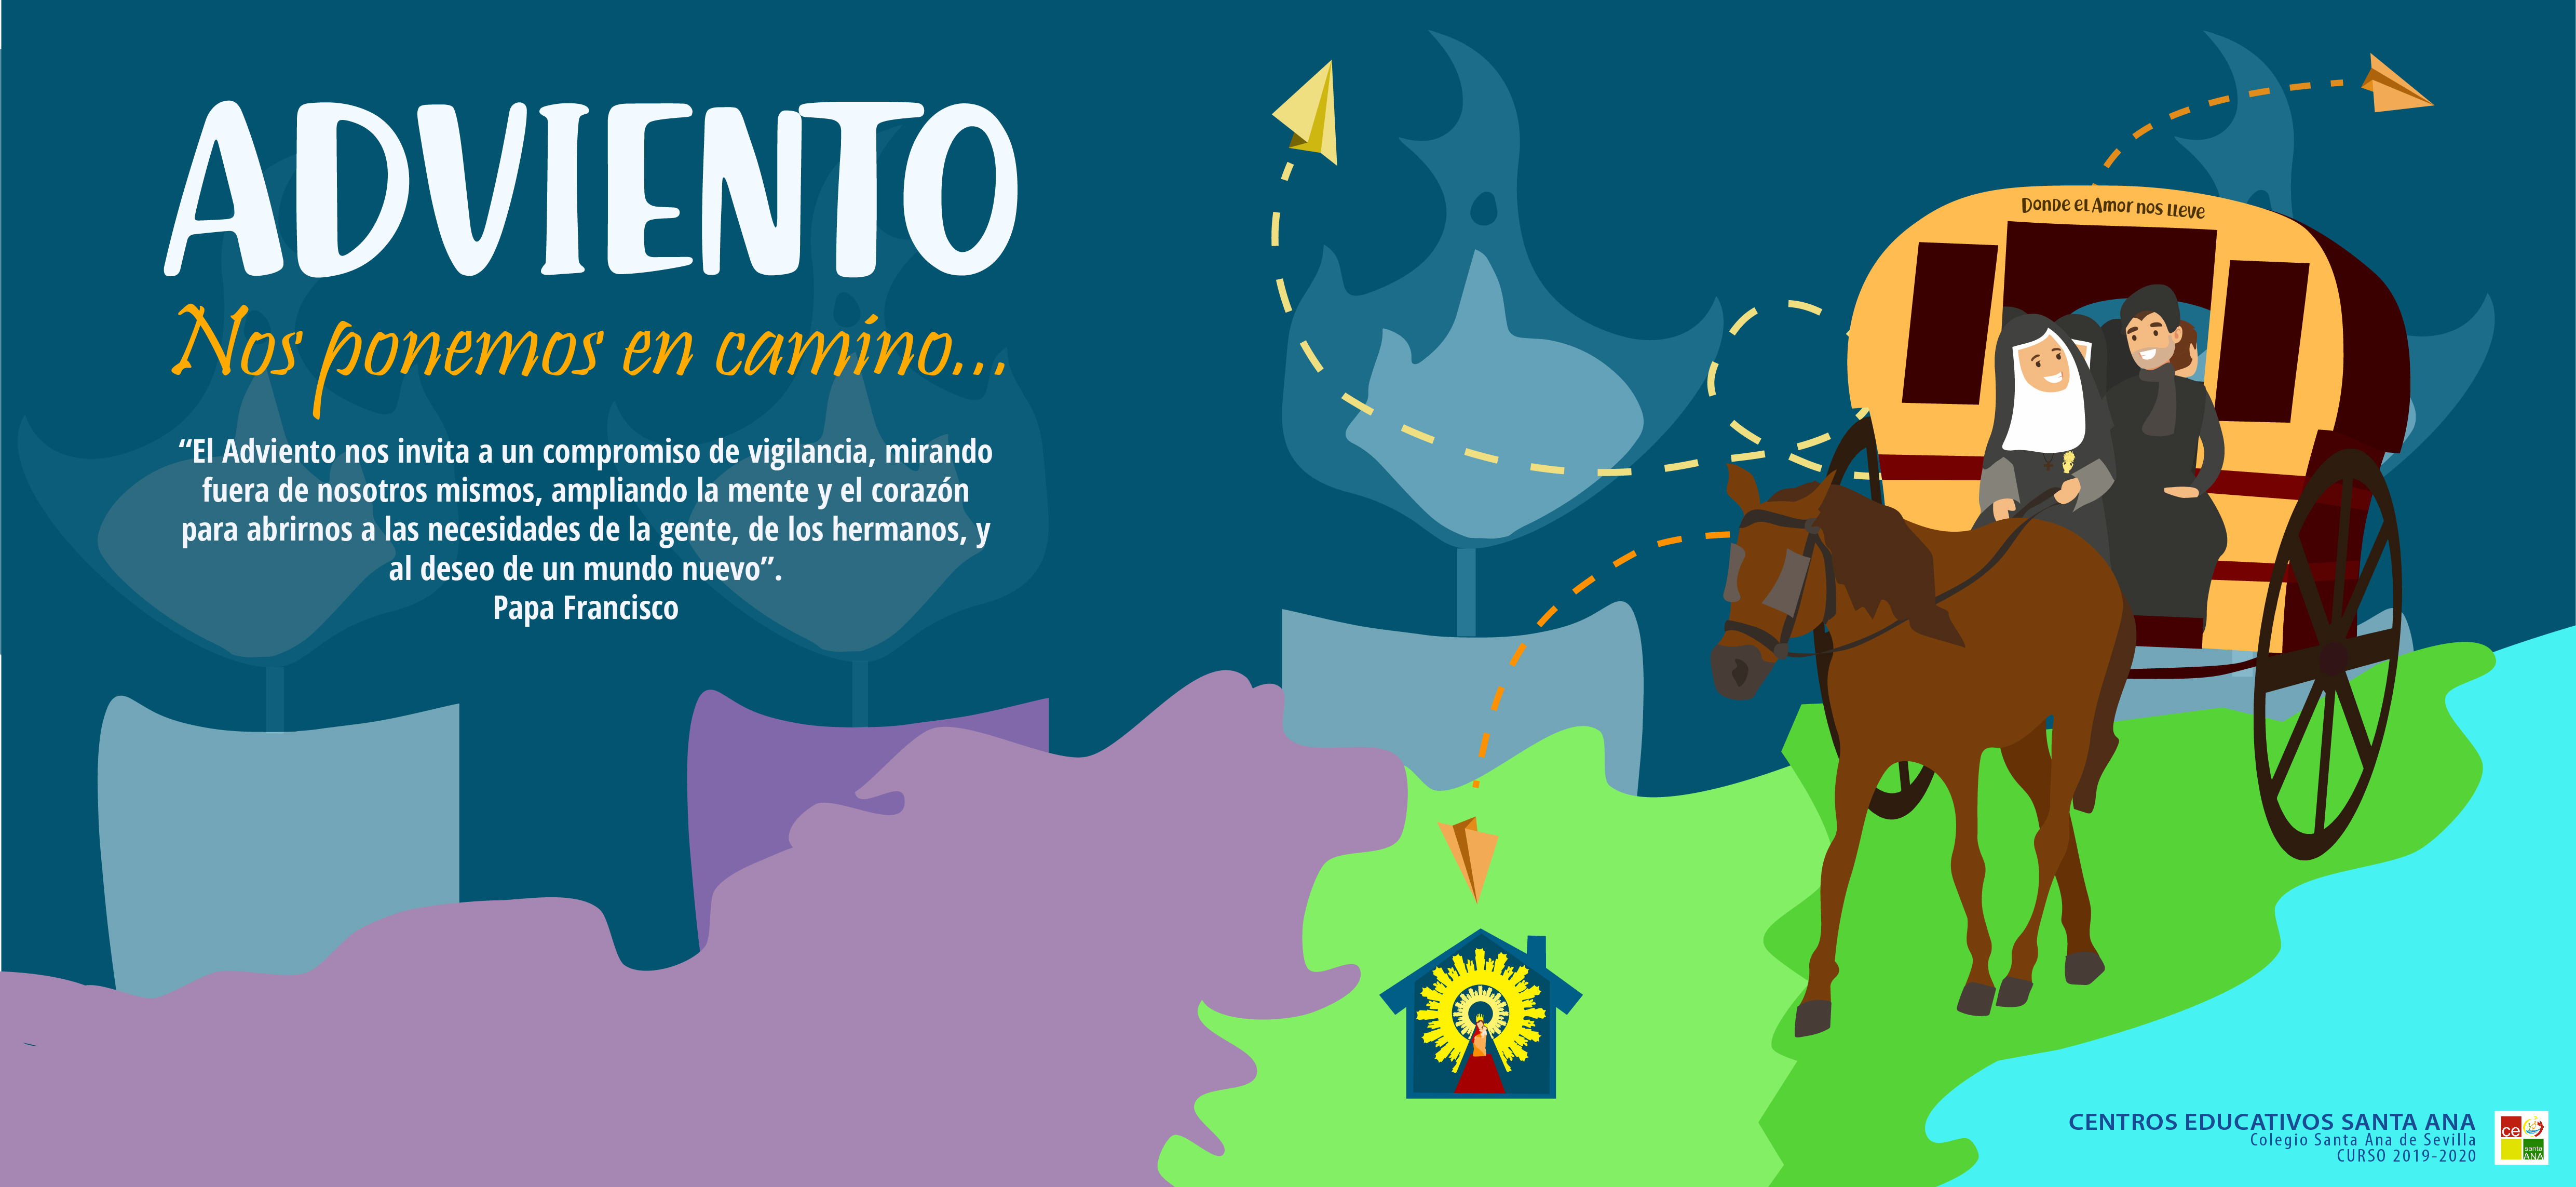 Adviento, cabecera web, curso 2019-2020.